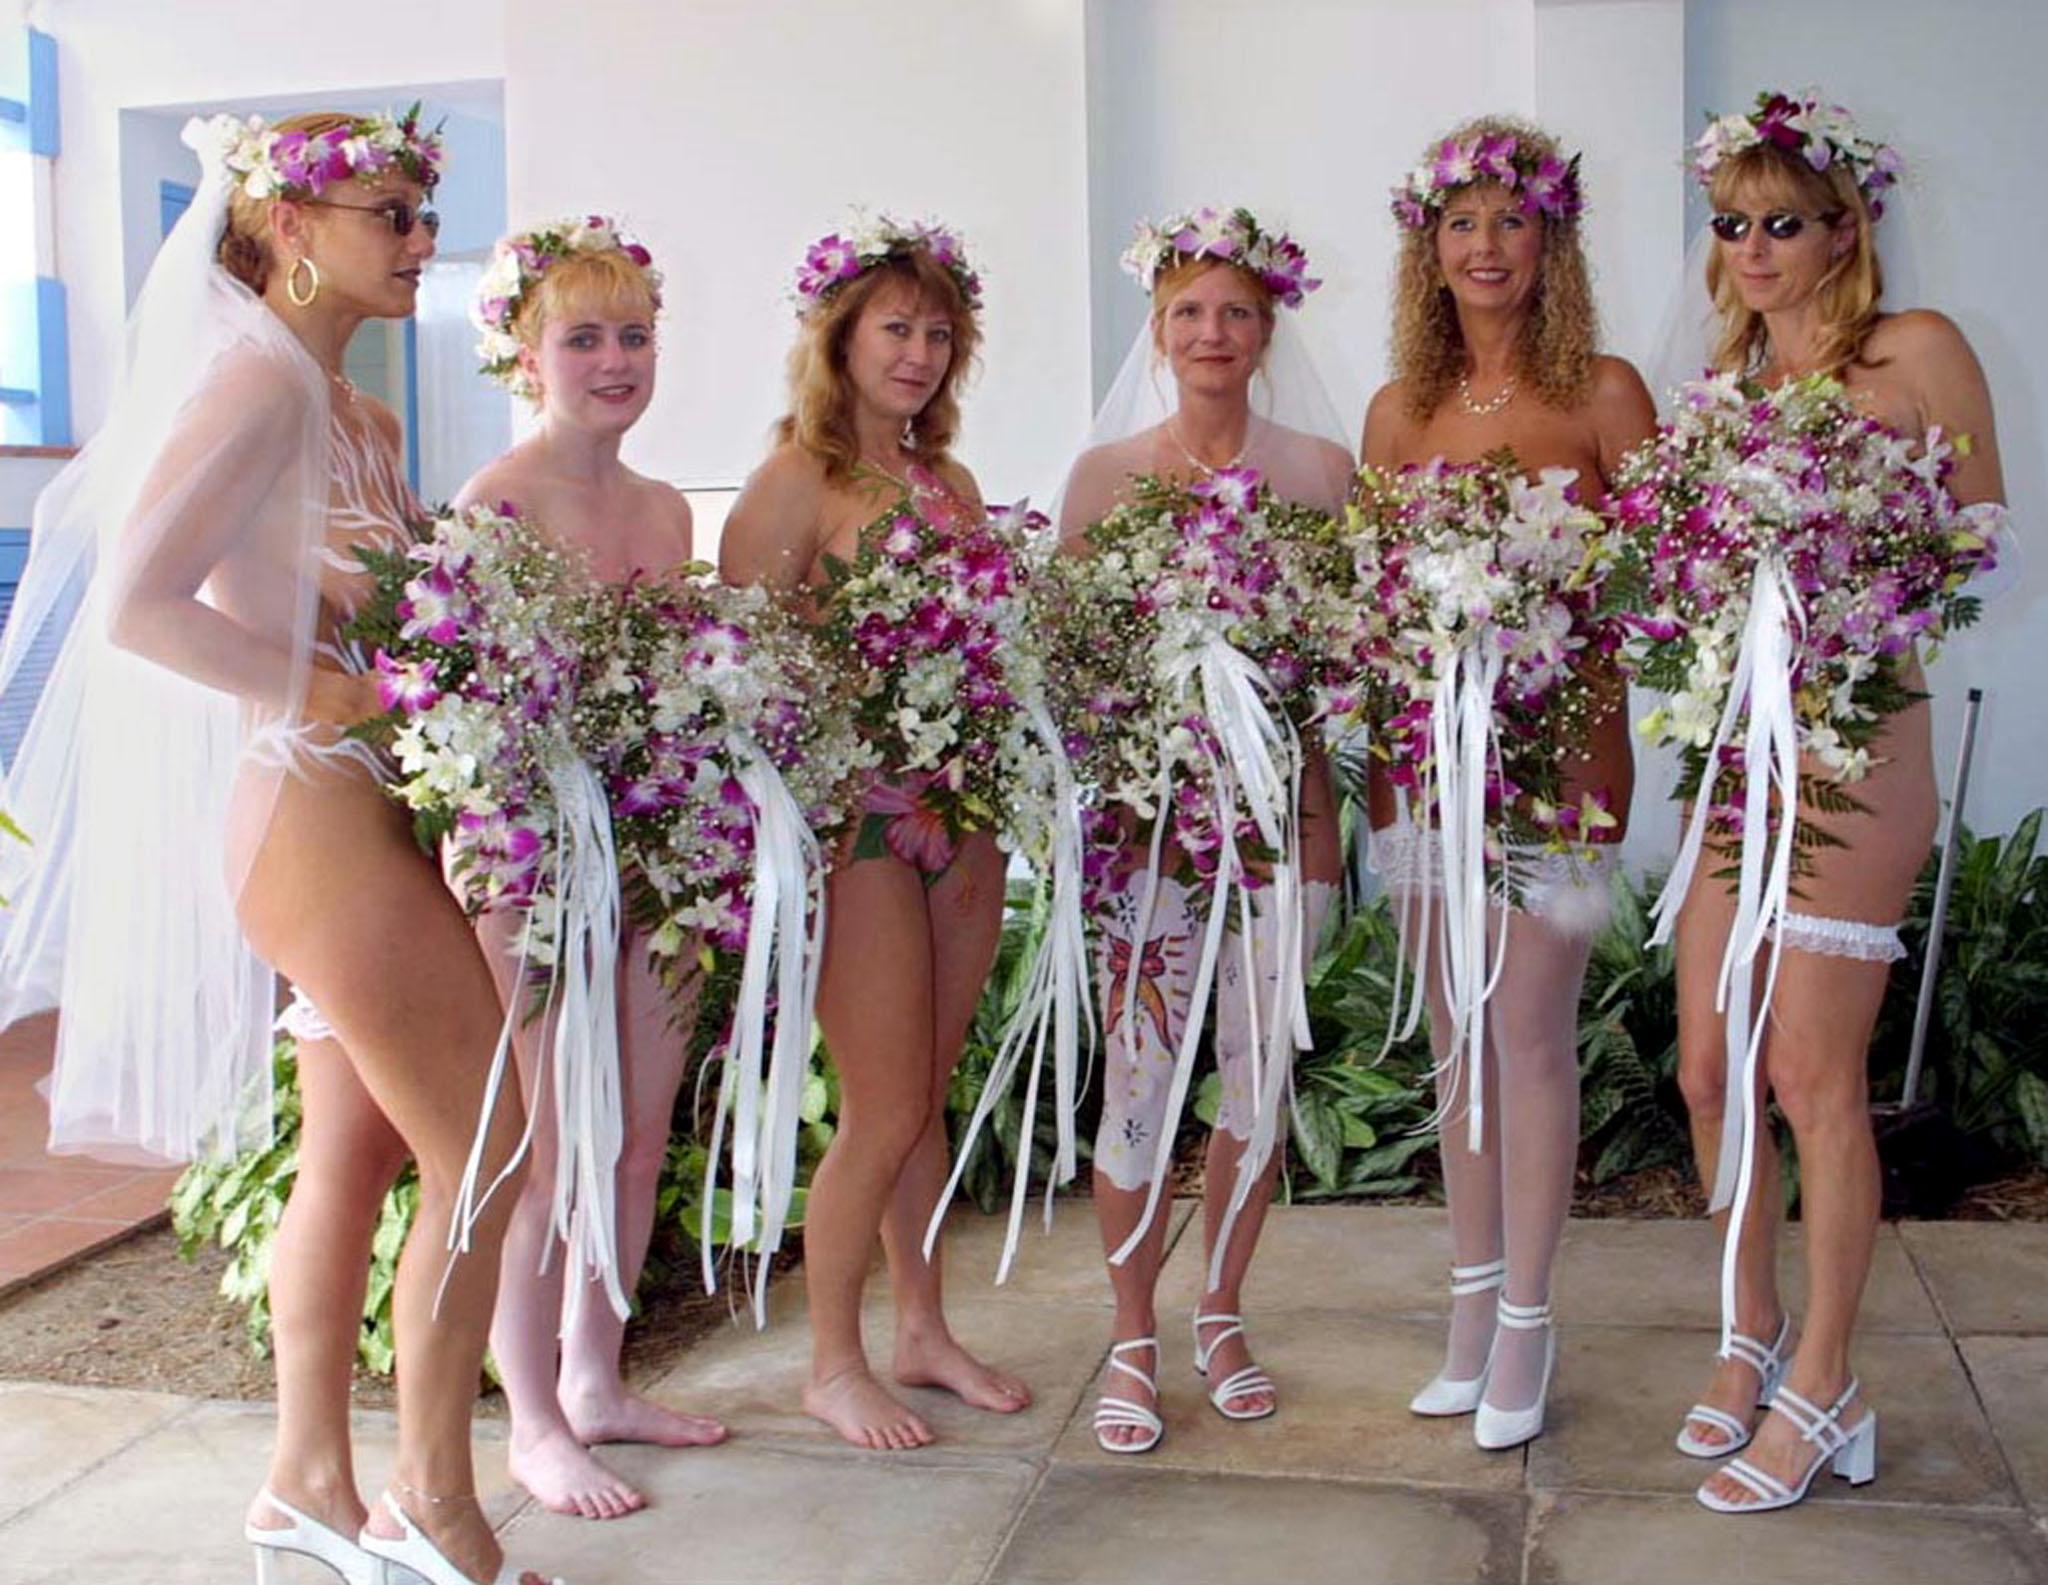 actres nude photo com